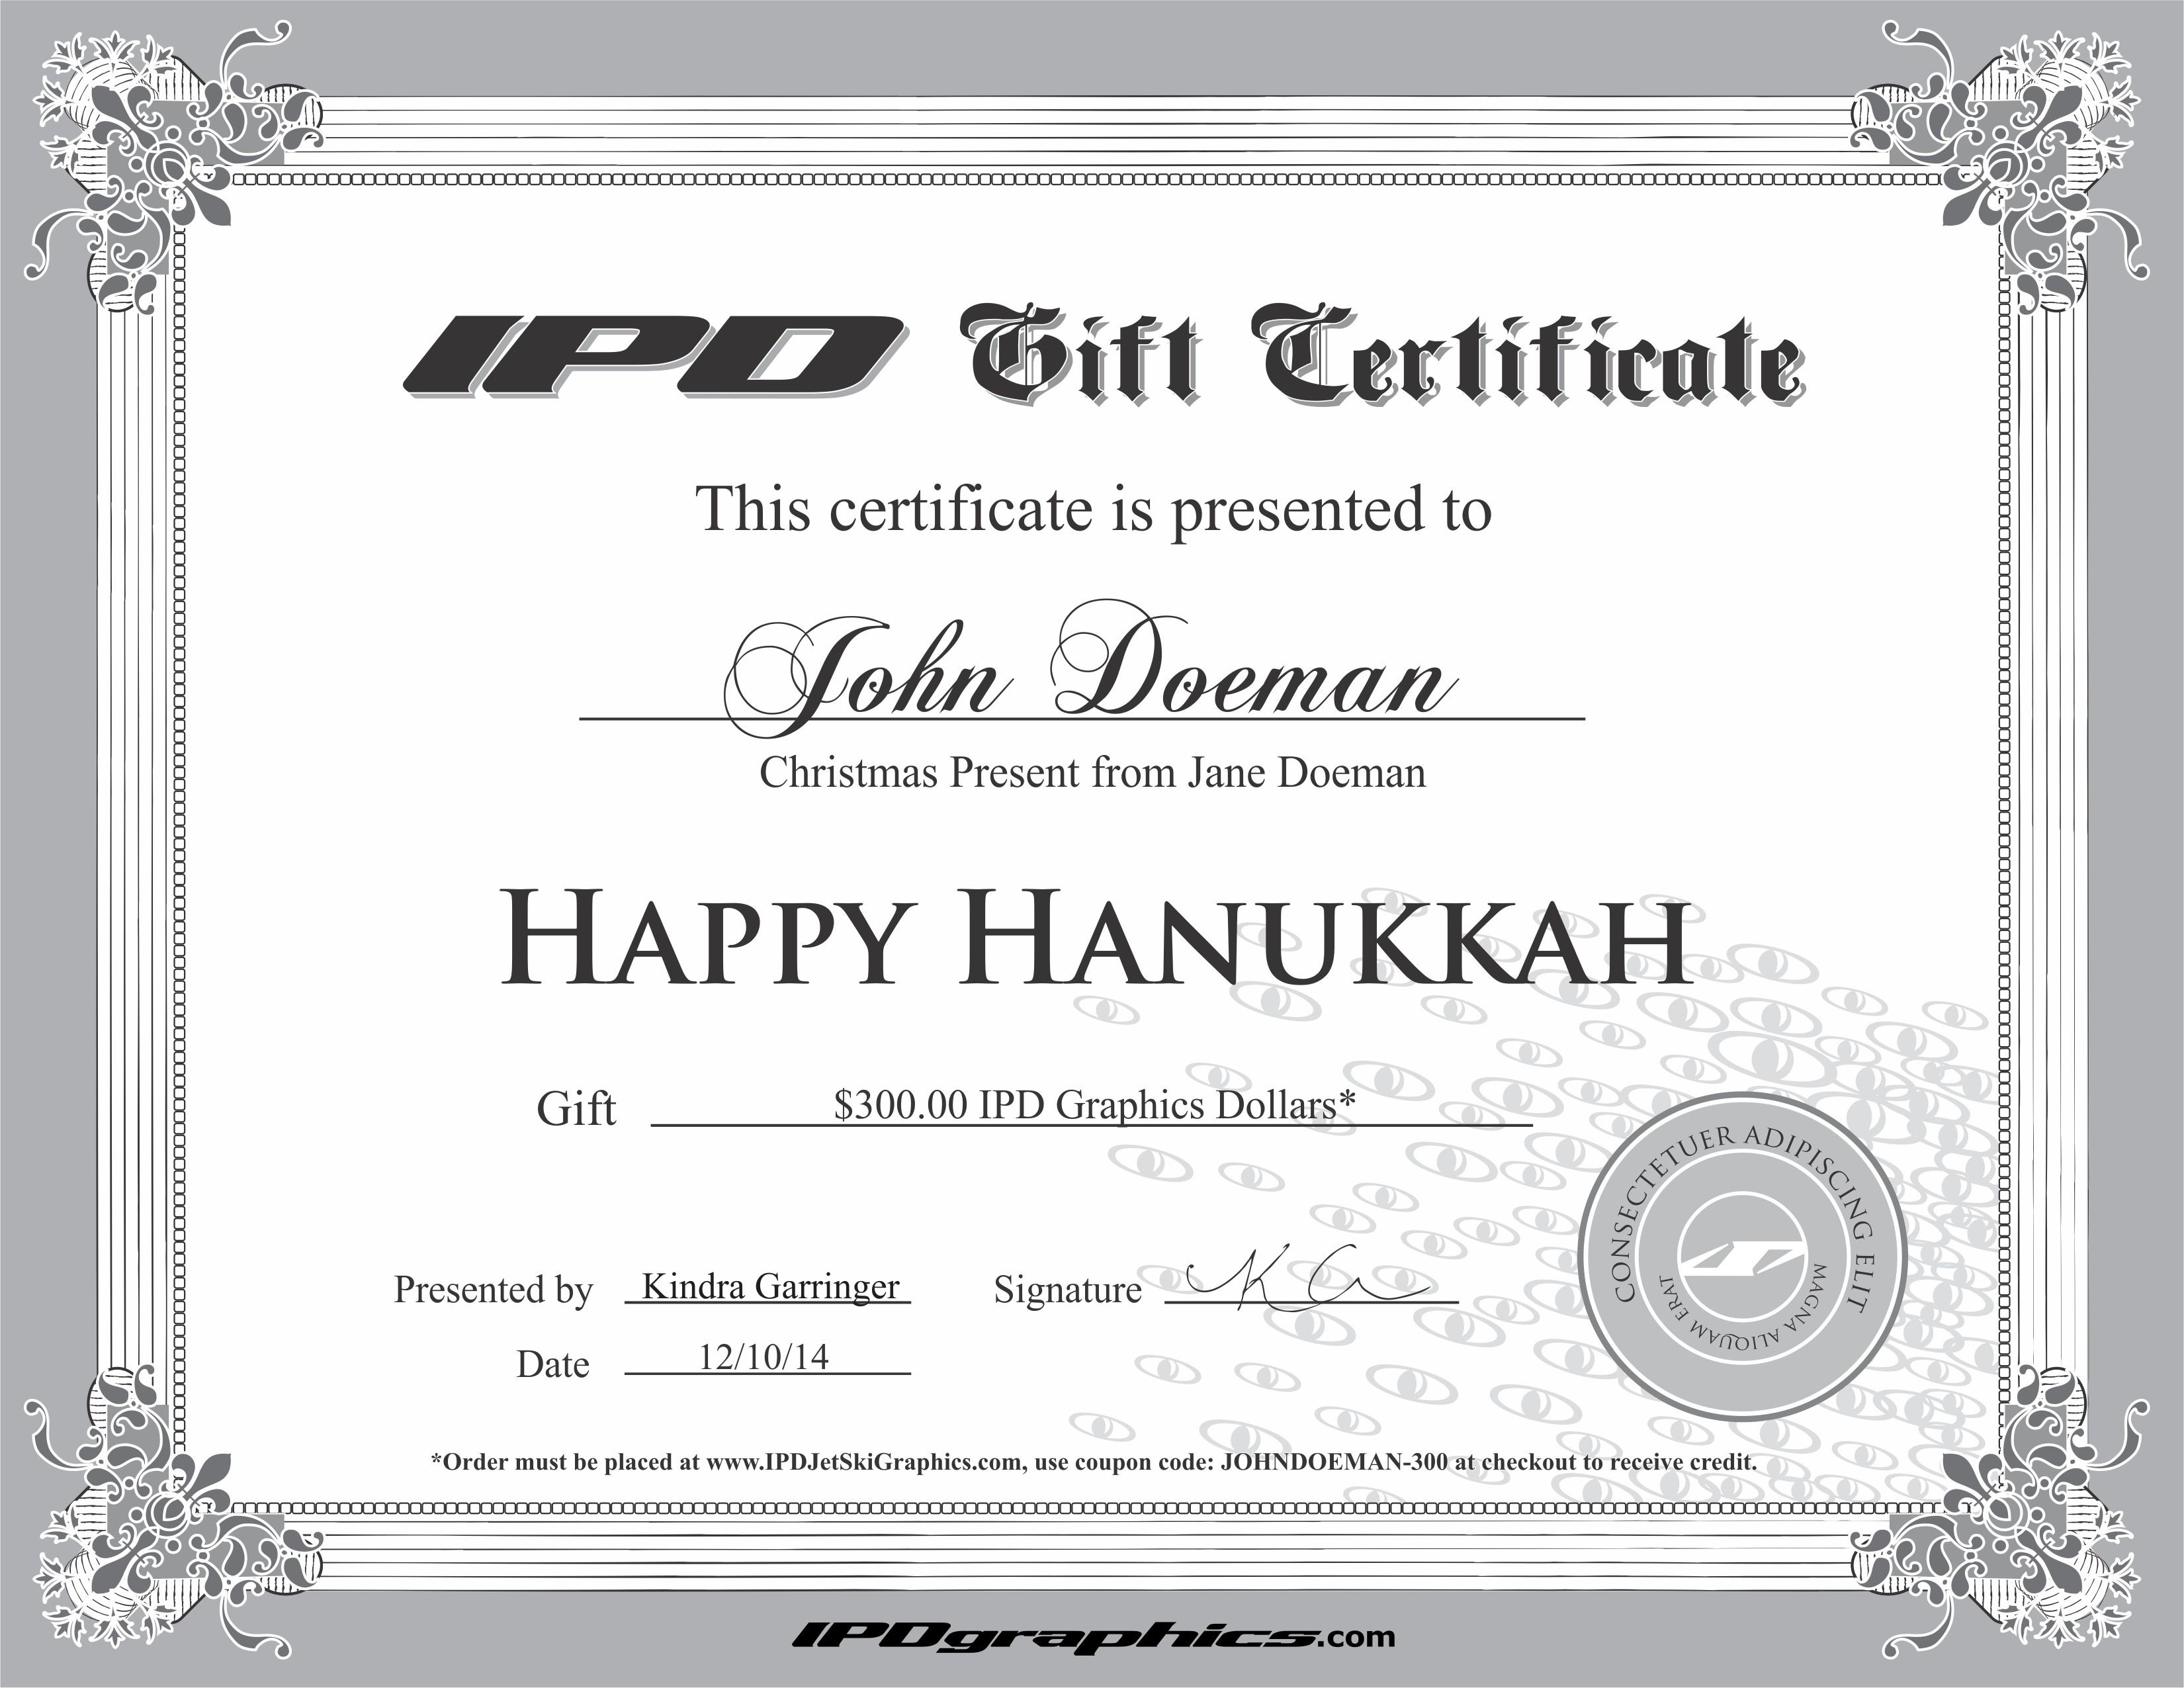 IPD Graphics Gift Certificate – IPD UTV Graphics